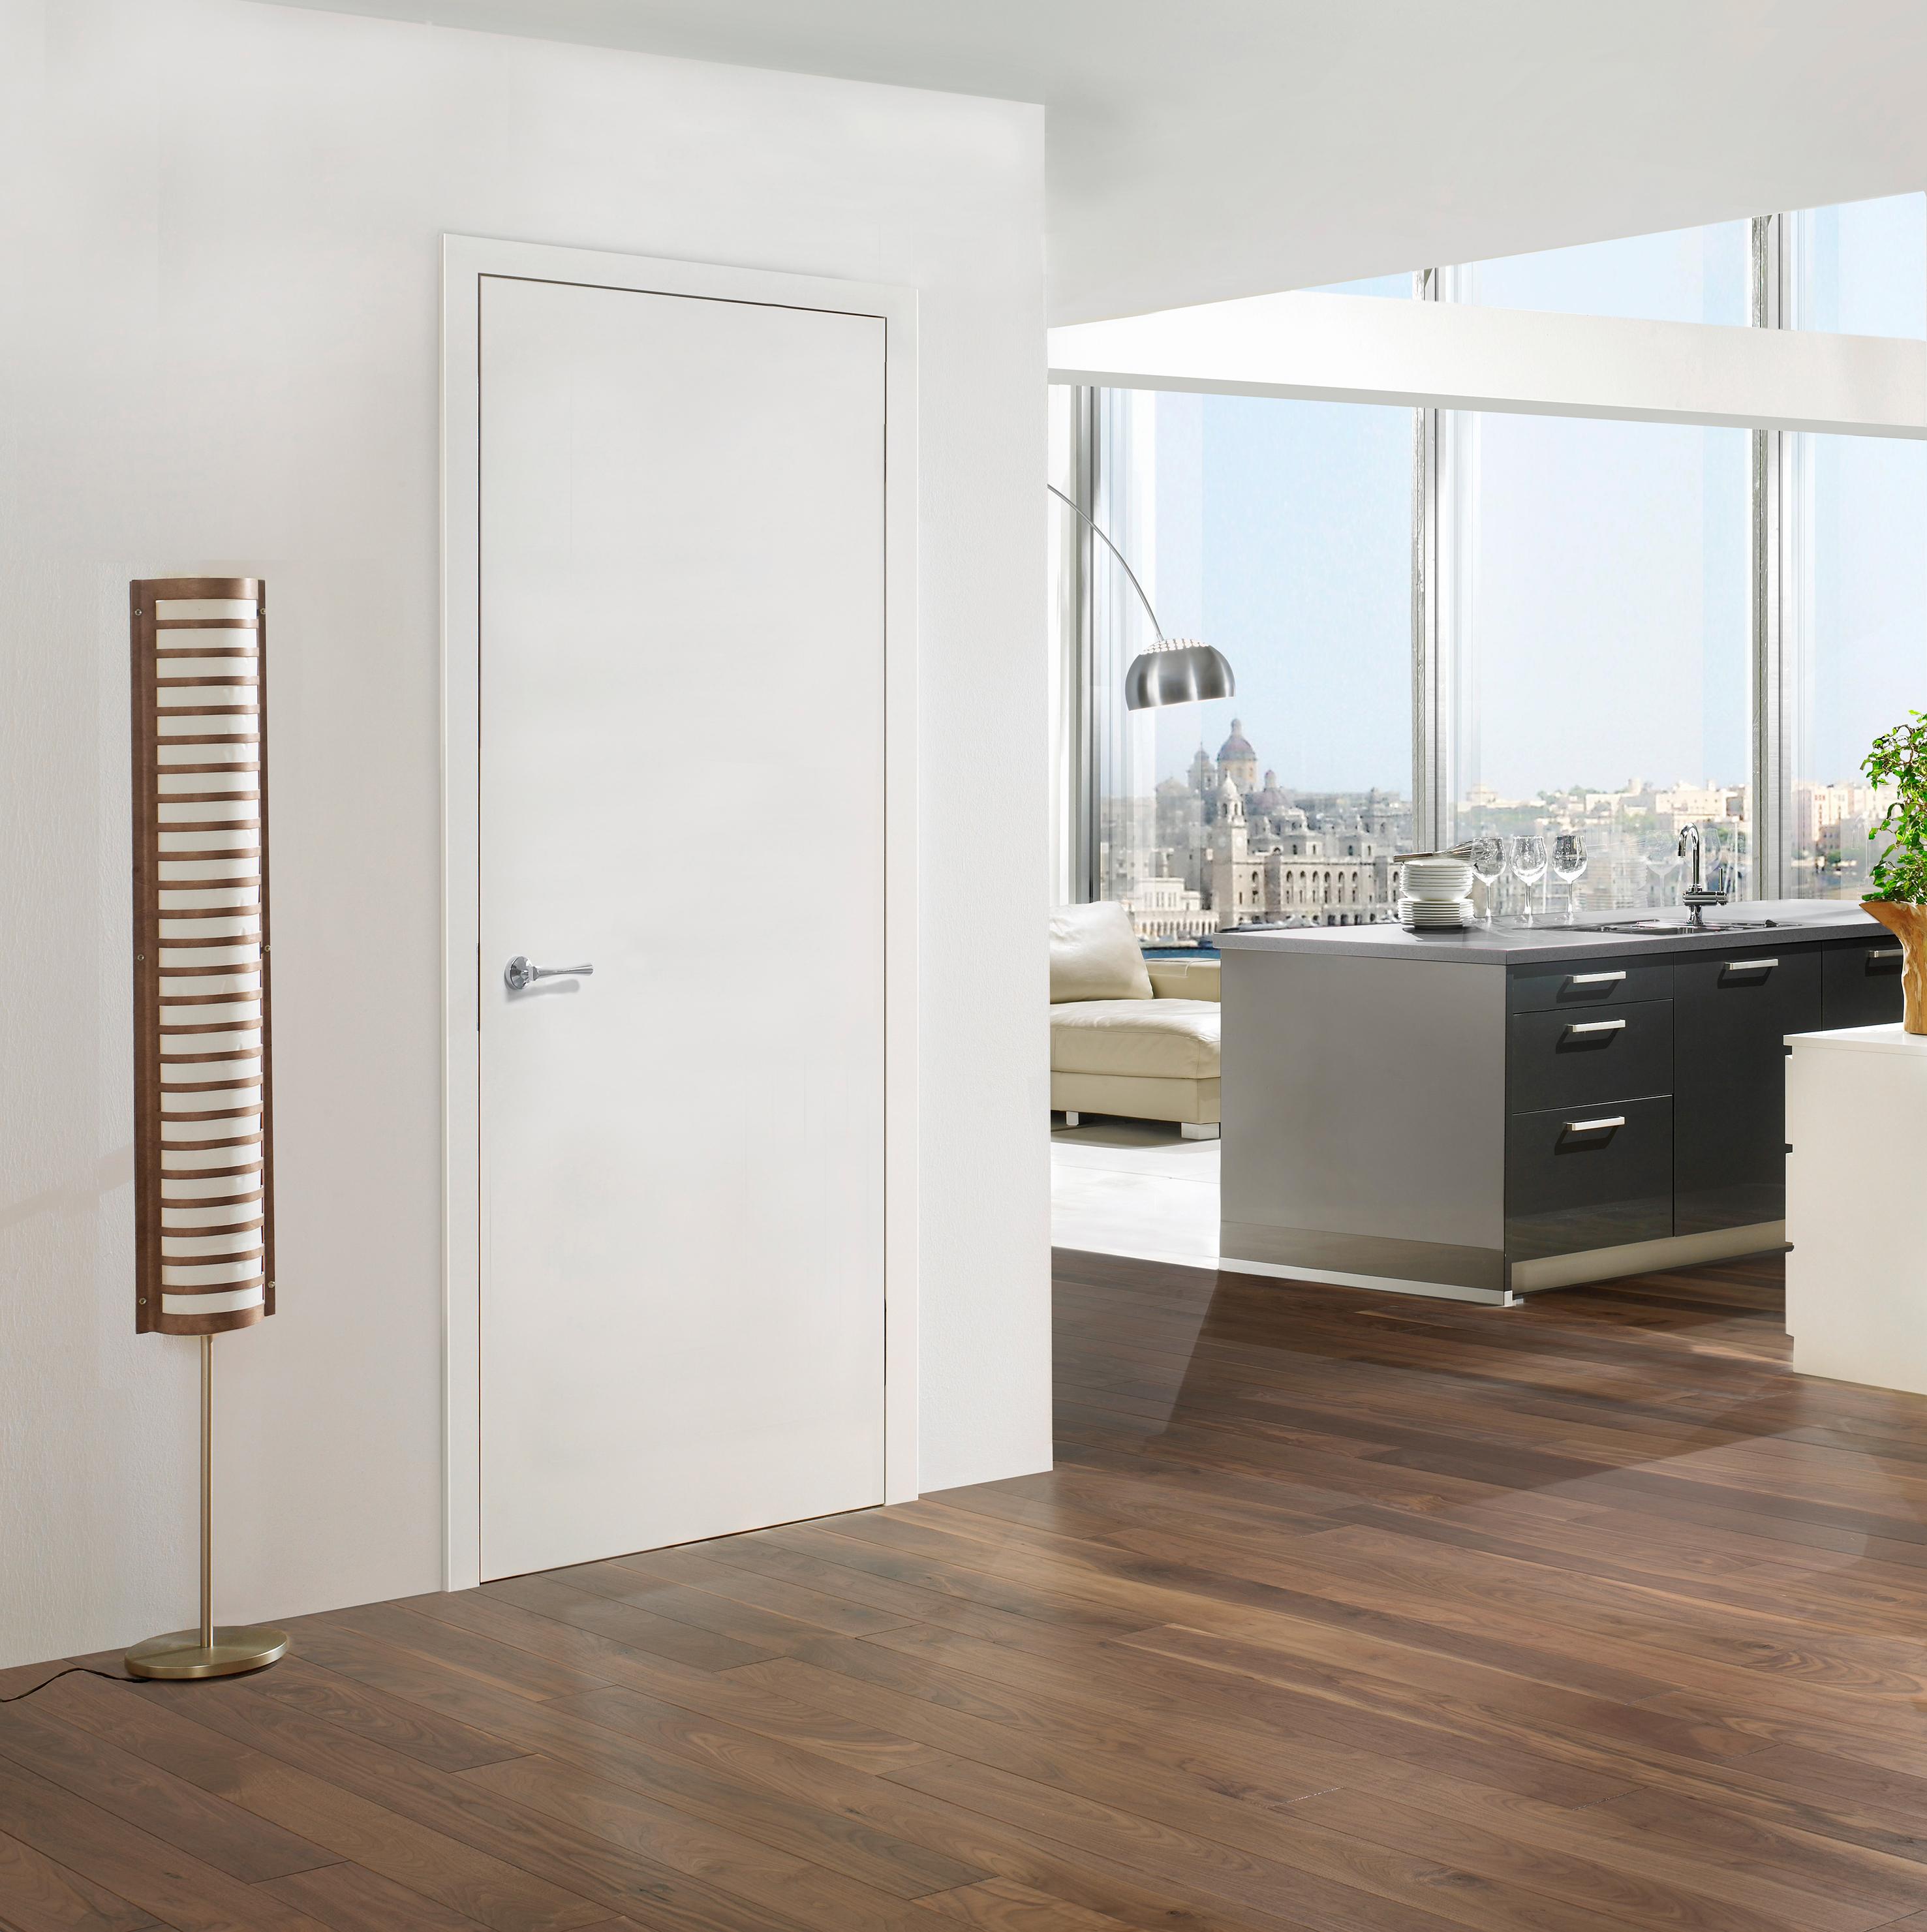 ral 9010 unterschied 9016 ostseesuche com. Black Bedroom Furniture Sets. Home Design Ideas